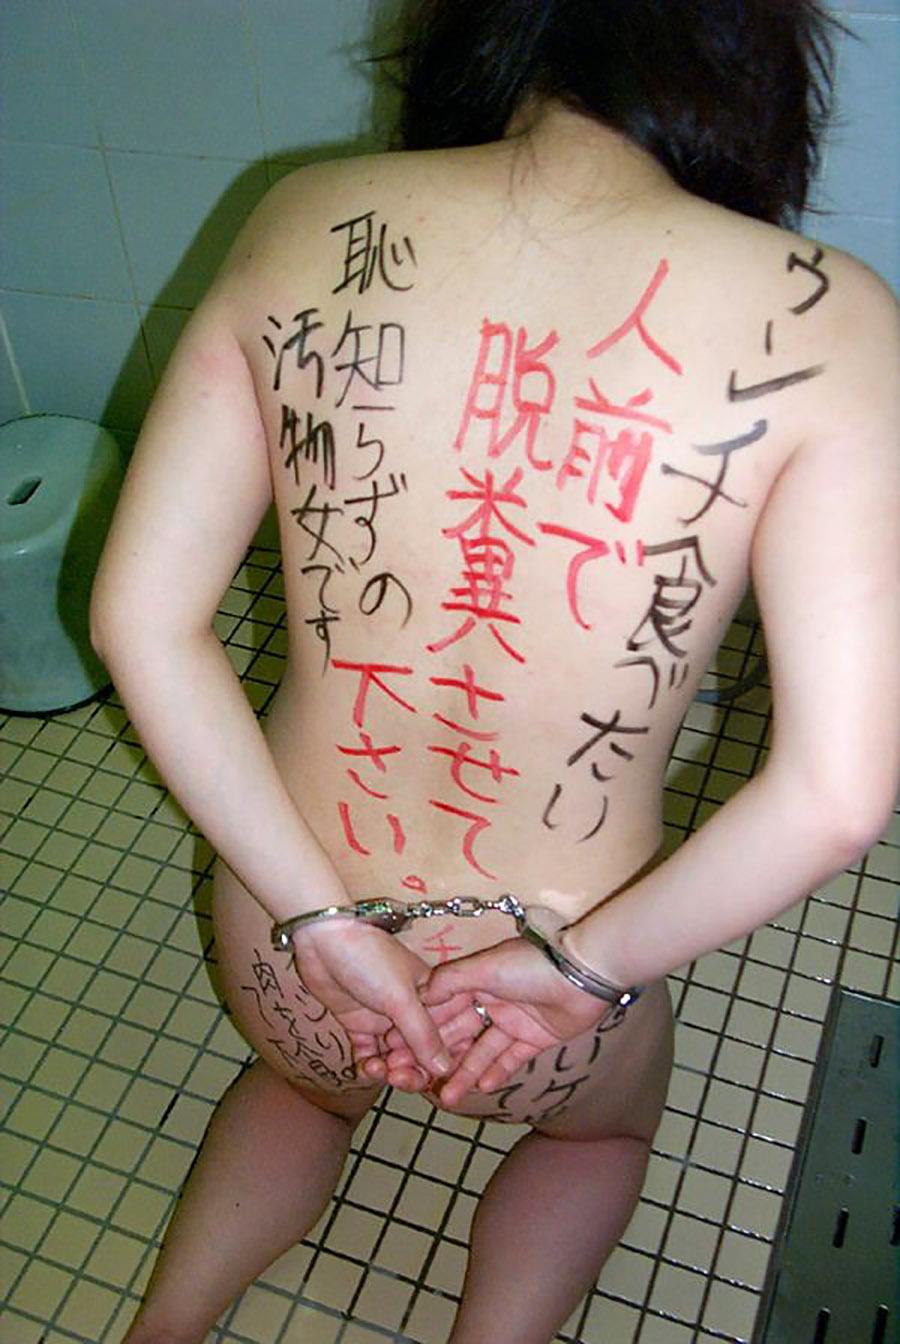 【SM落書き】公衆肉便器扱いされるのが趣味な女のエロ画像がコチラwwwwww